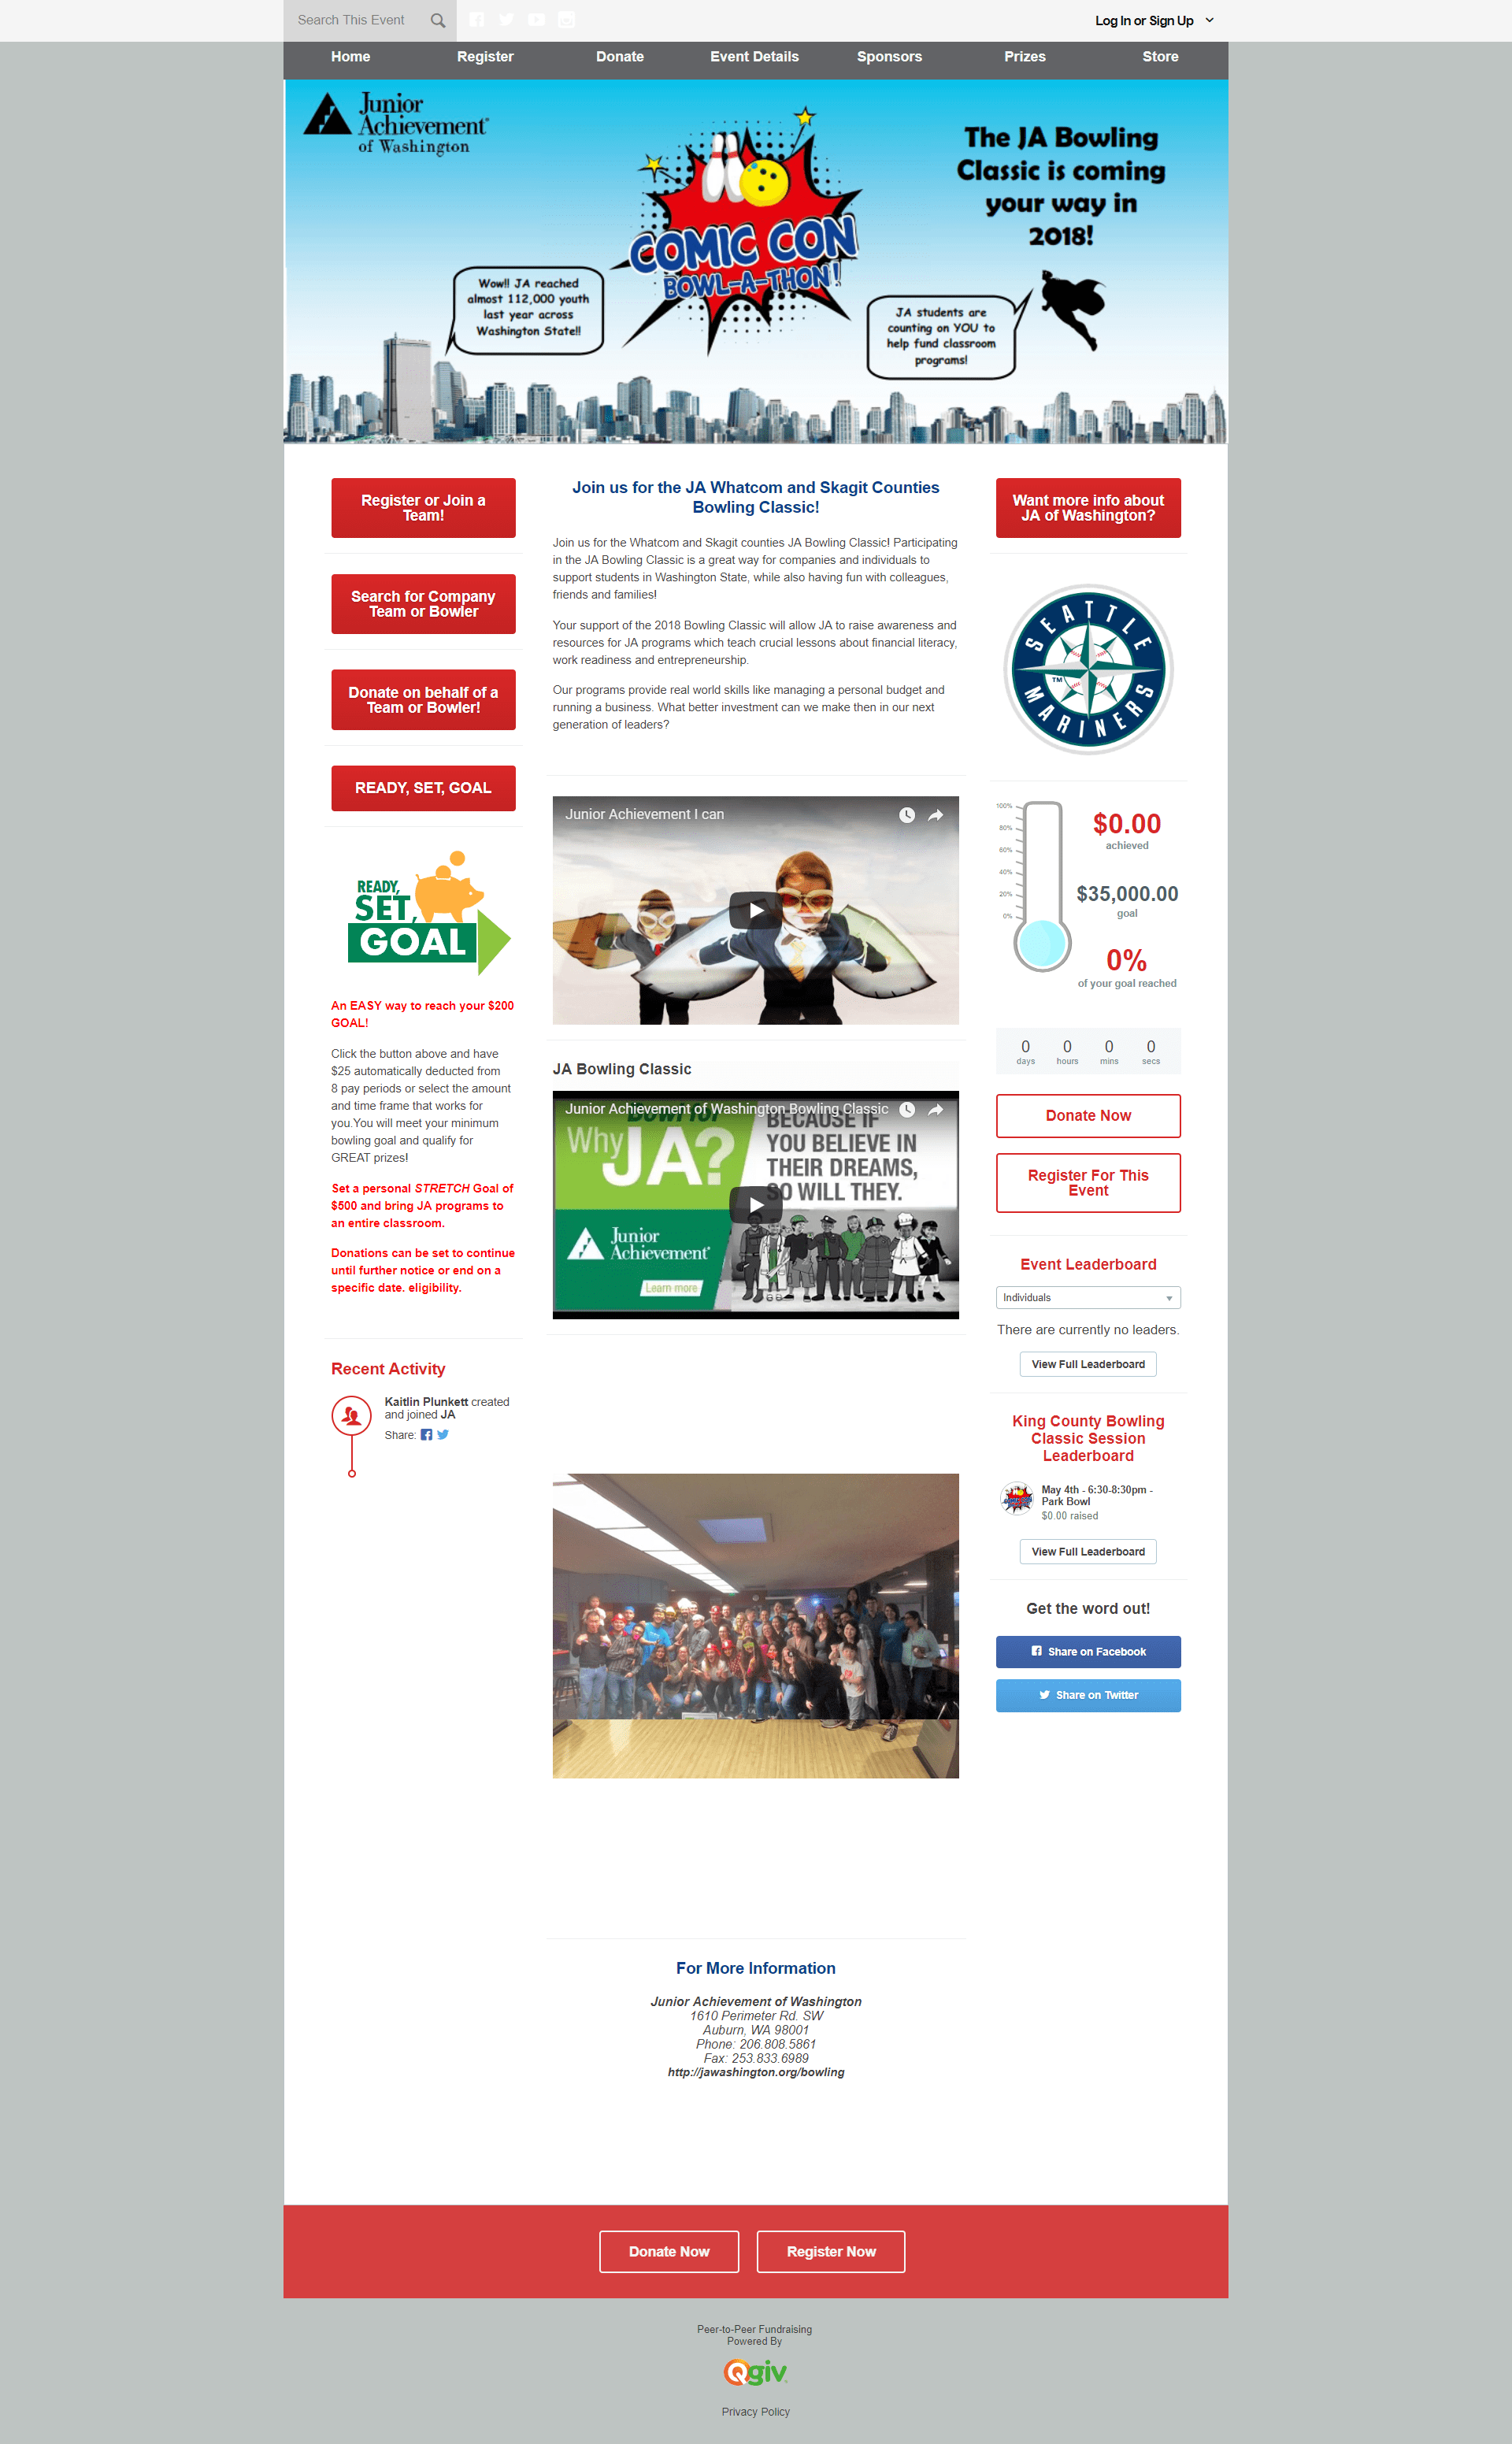 QGiv Charity Bowling Fundraising Page Screenshot